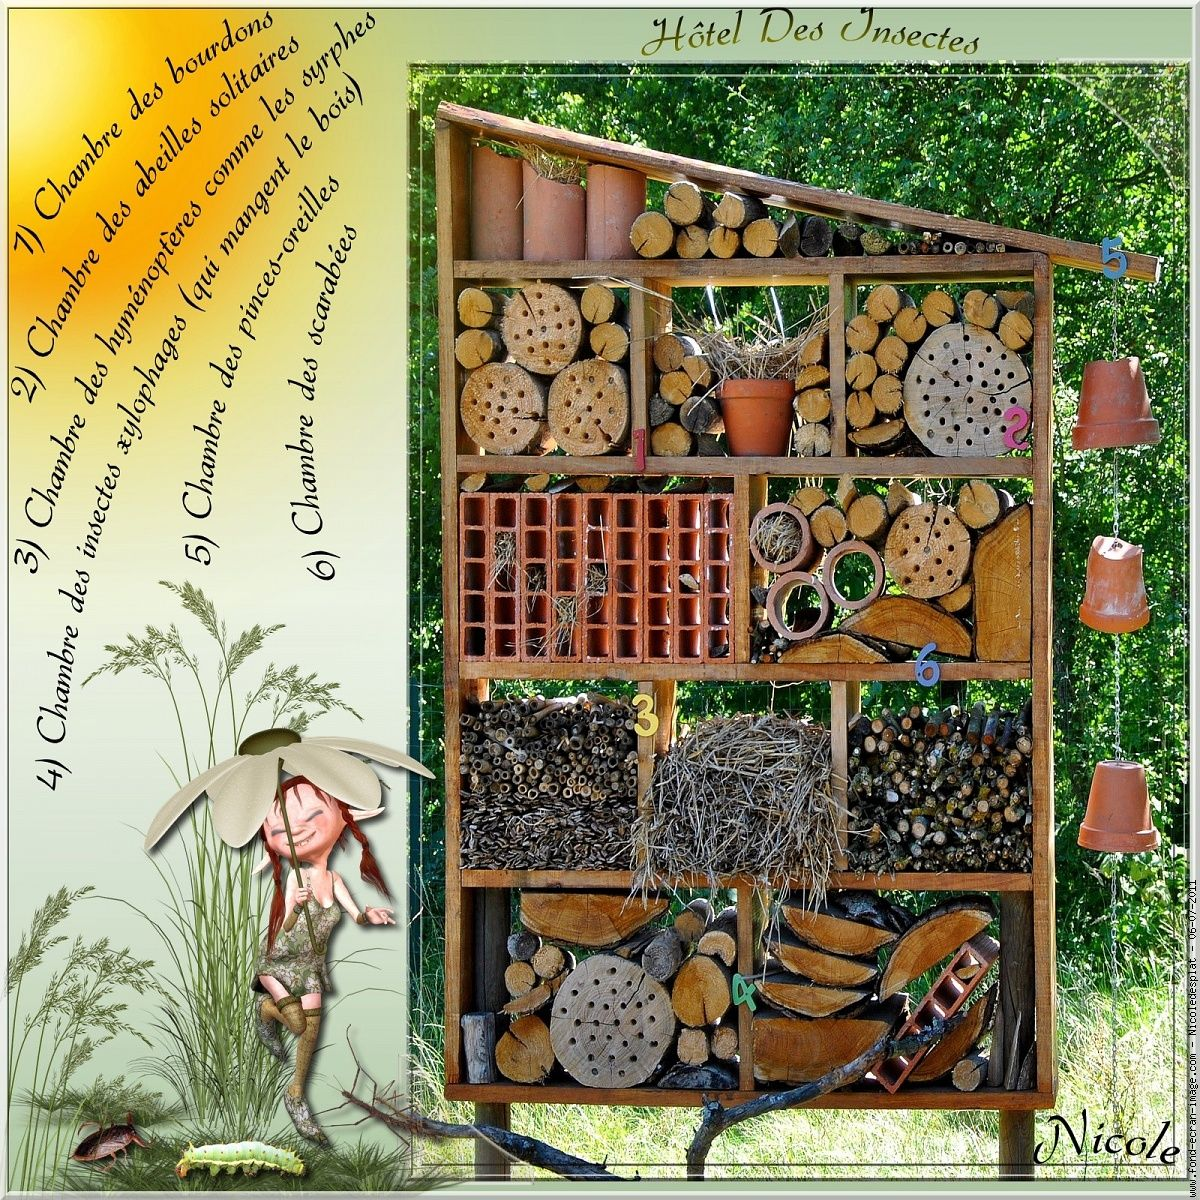 nichoir hotel des insectes gartenideen pinterest bug. Black Bedroom Furniture Sets. Home Design Ideas